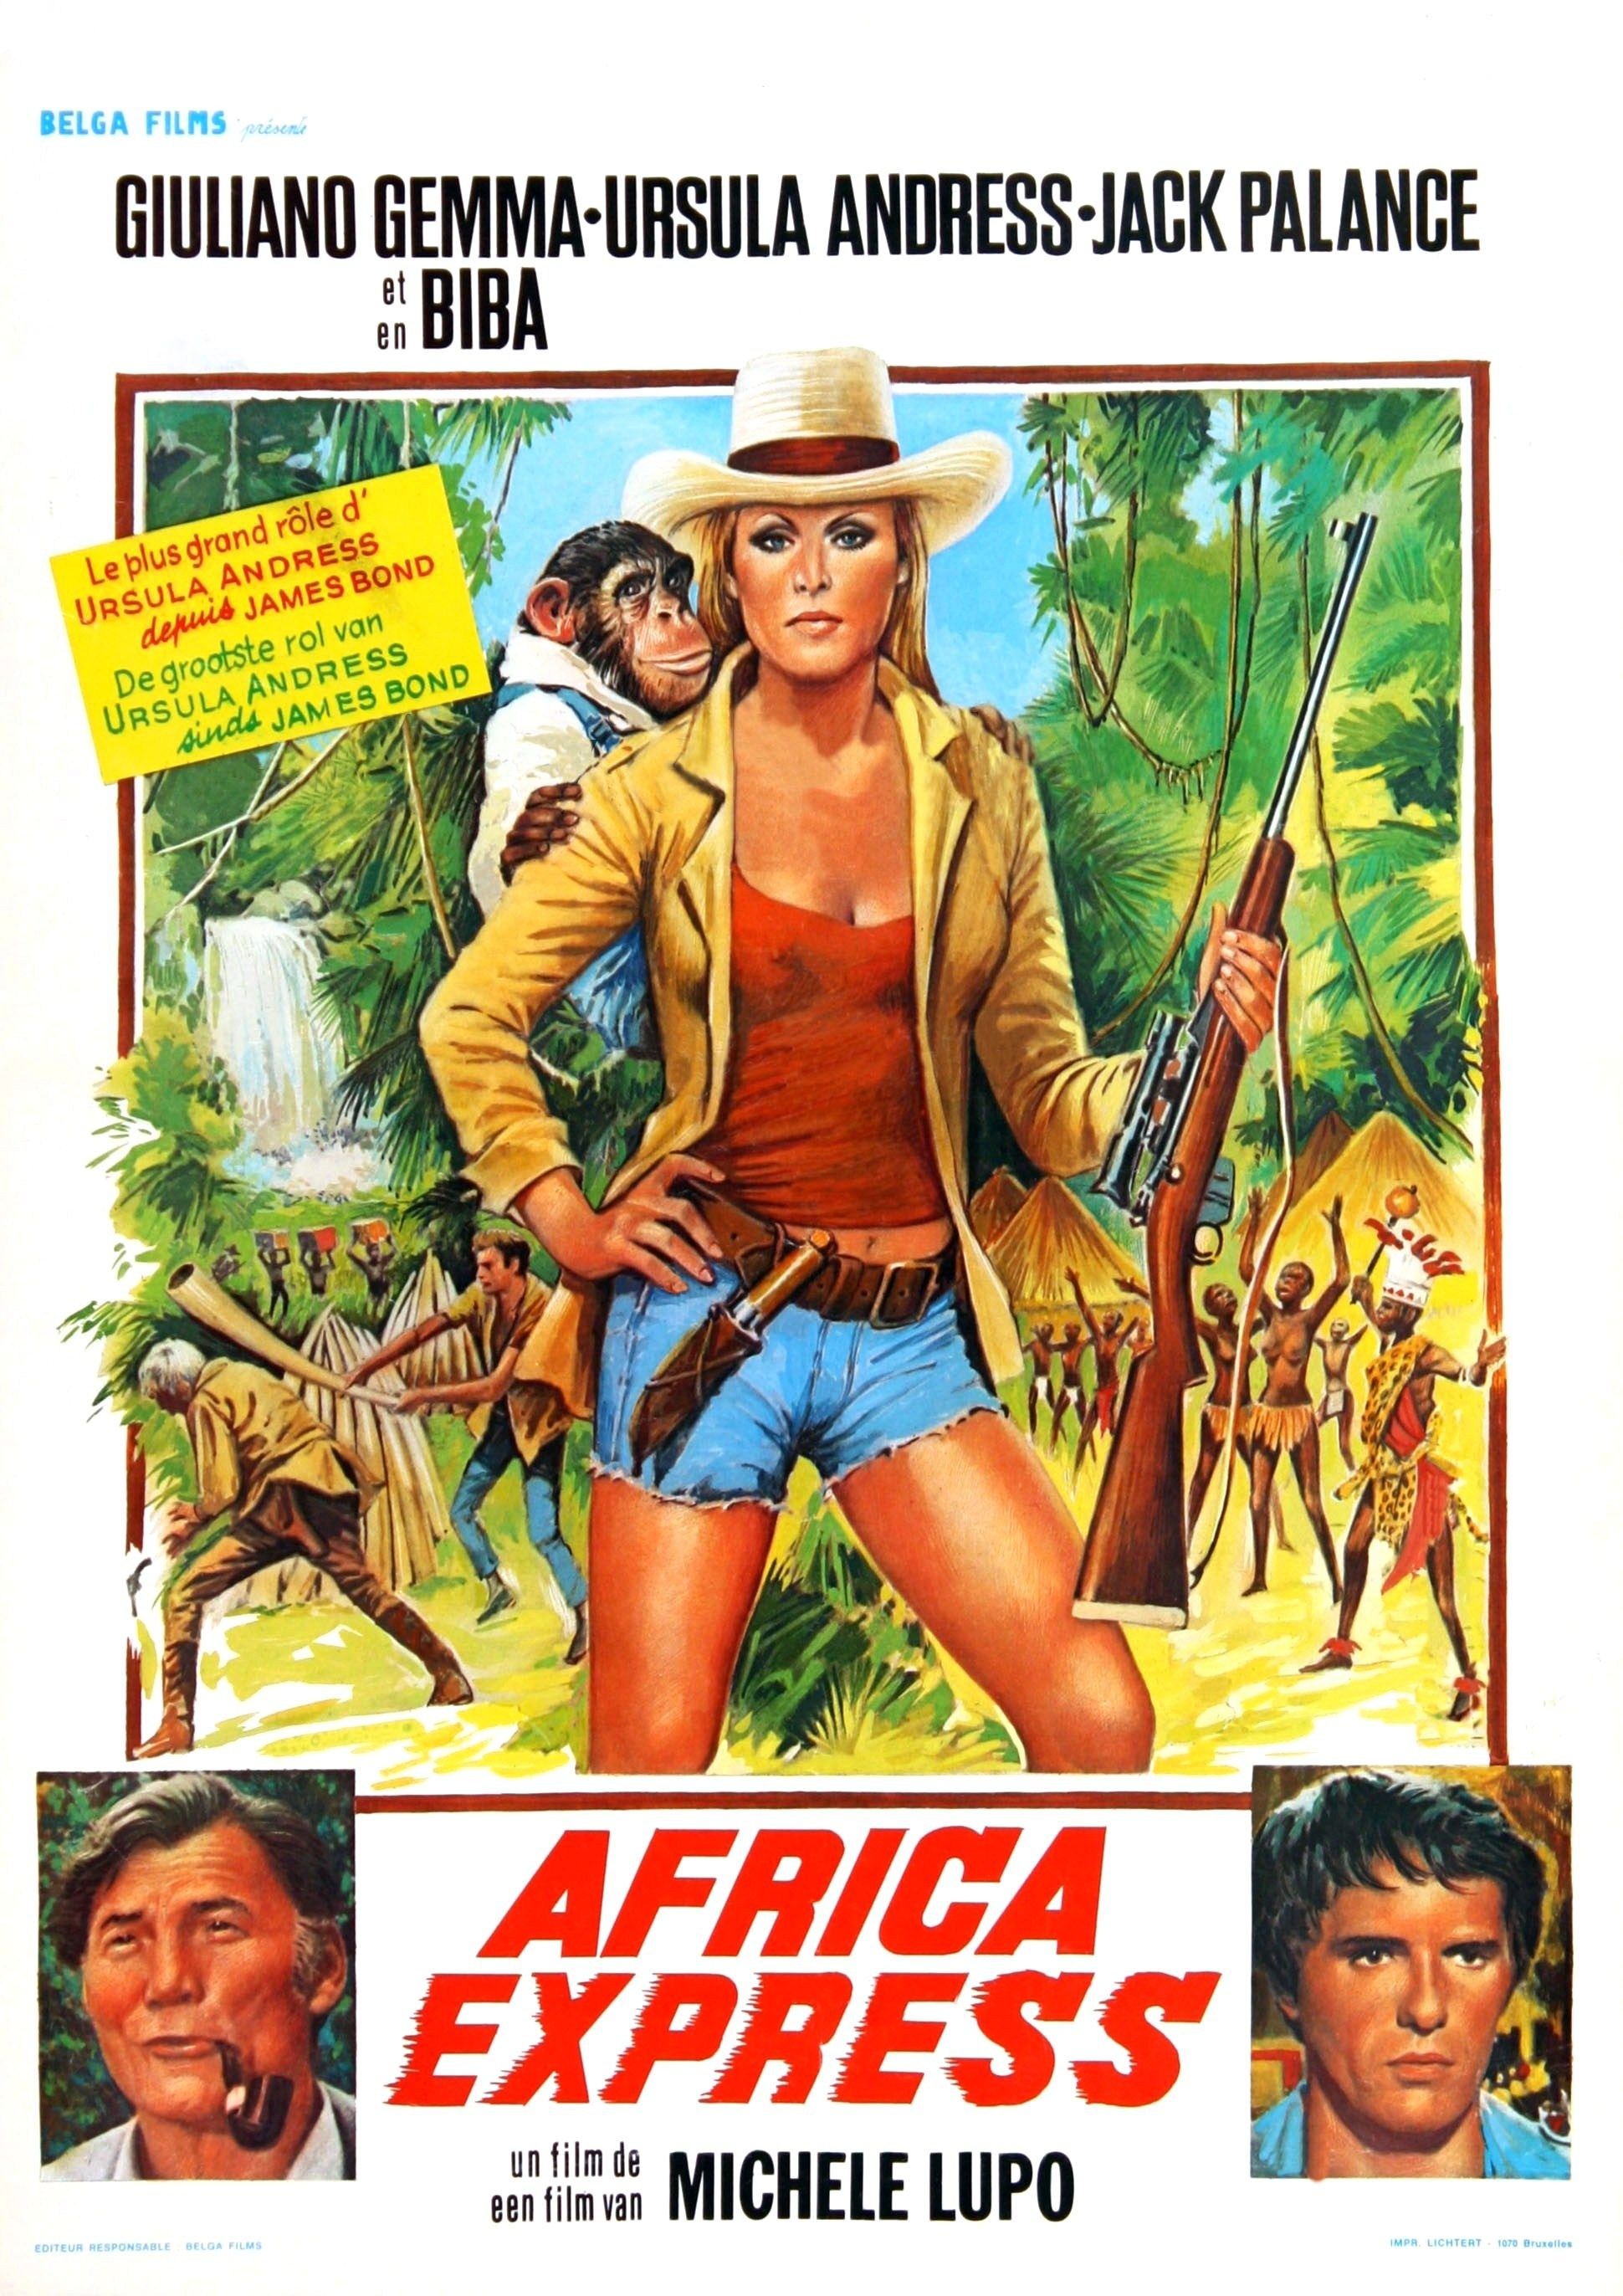 Jack Palance Filmes Beautiful africa express (1976) - gulliano gemma - ursula andress - jack